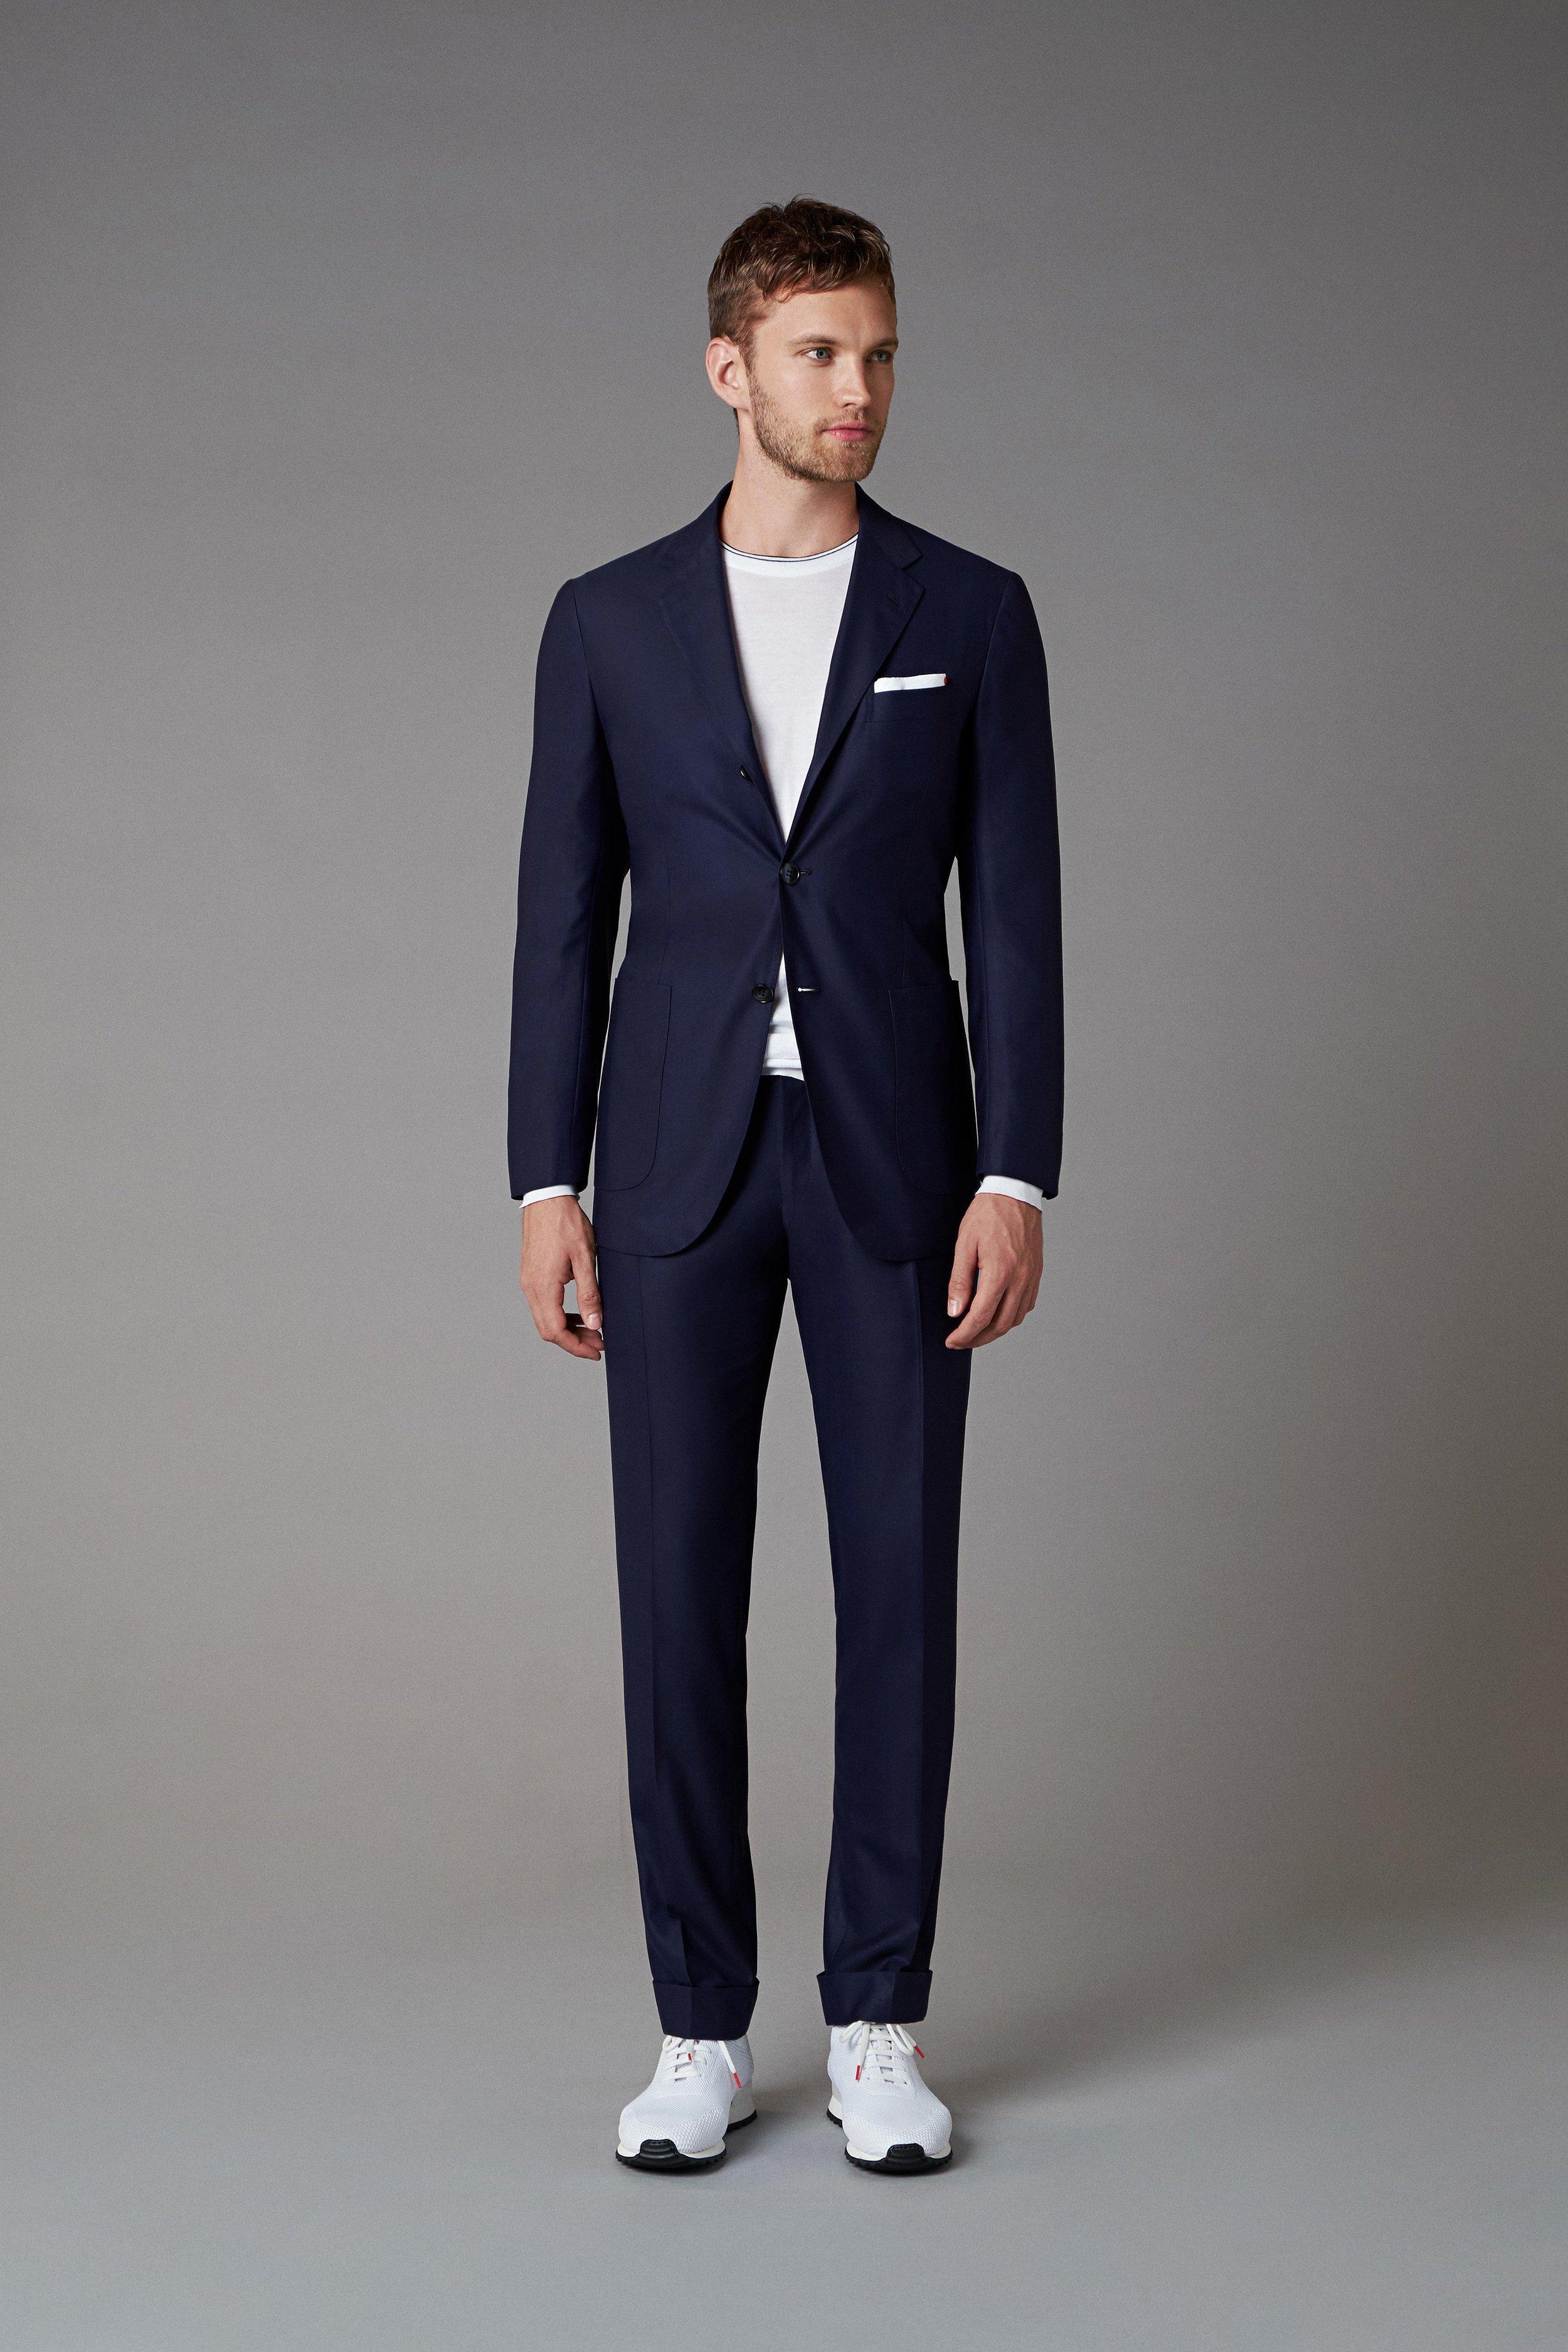 00001-Kiton-Vogue-Menswear-SS19-pr.jpg